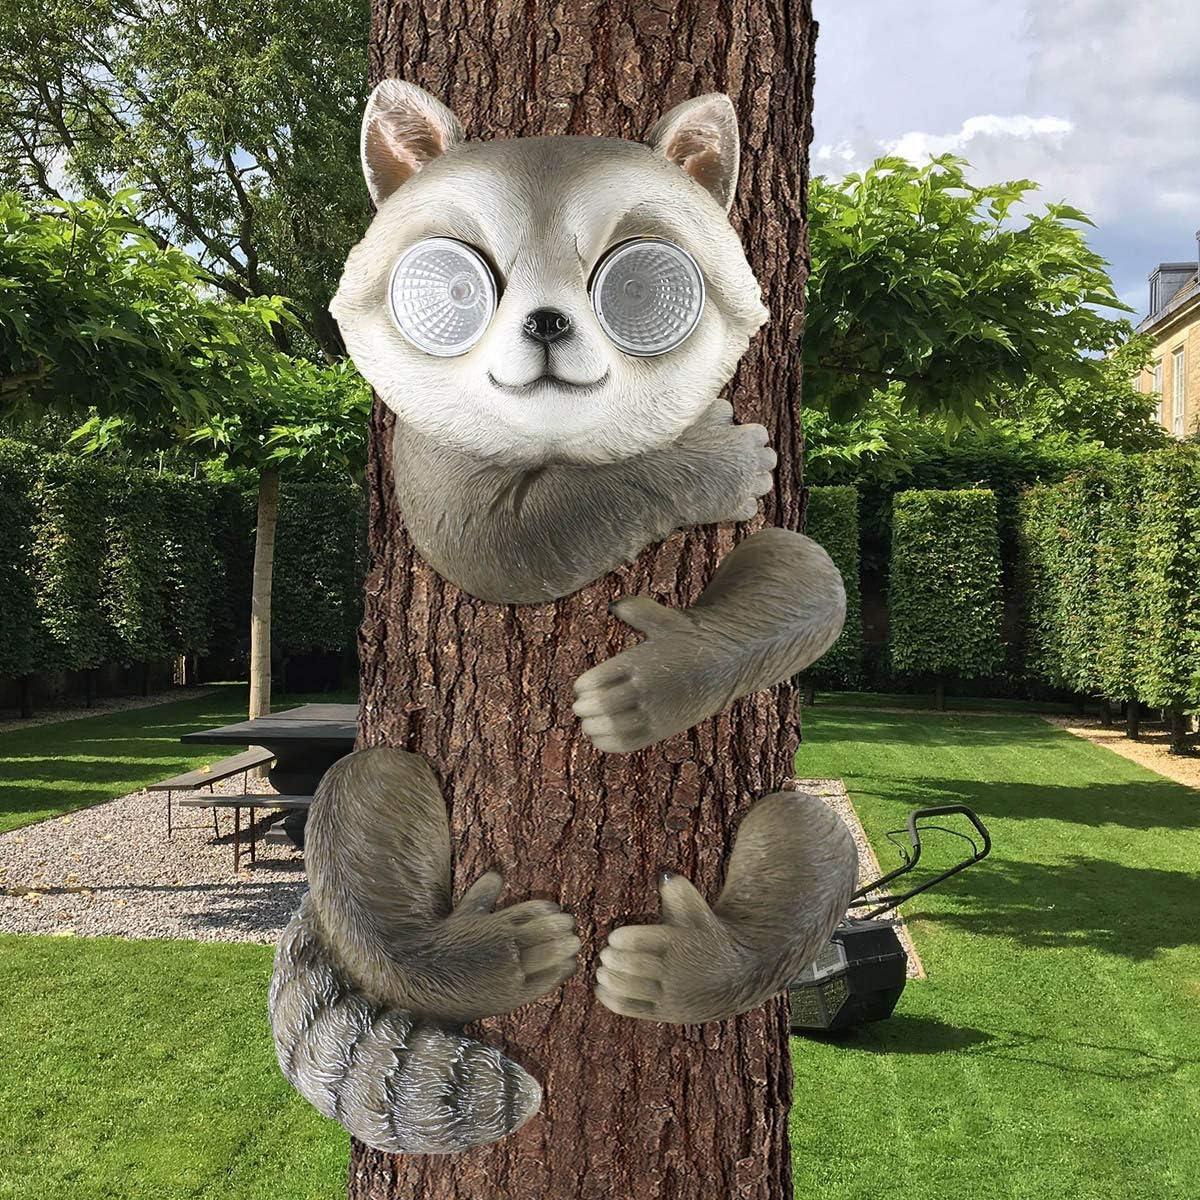 LIMEIDE Upgraded Big Size Solar Bear Tree Hugger/Peeker/Sculpture, Decorative Whimsical Bear Statue with Solar Light Eyes for Yard Art, Outdoor Garden Courtyard Decor- Housewarming Gift